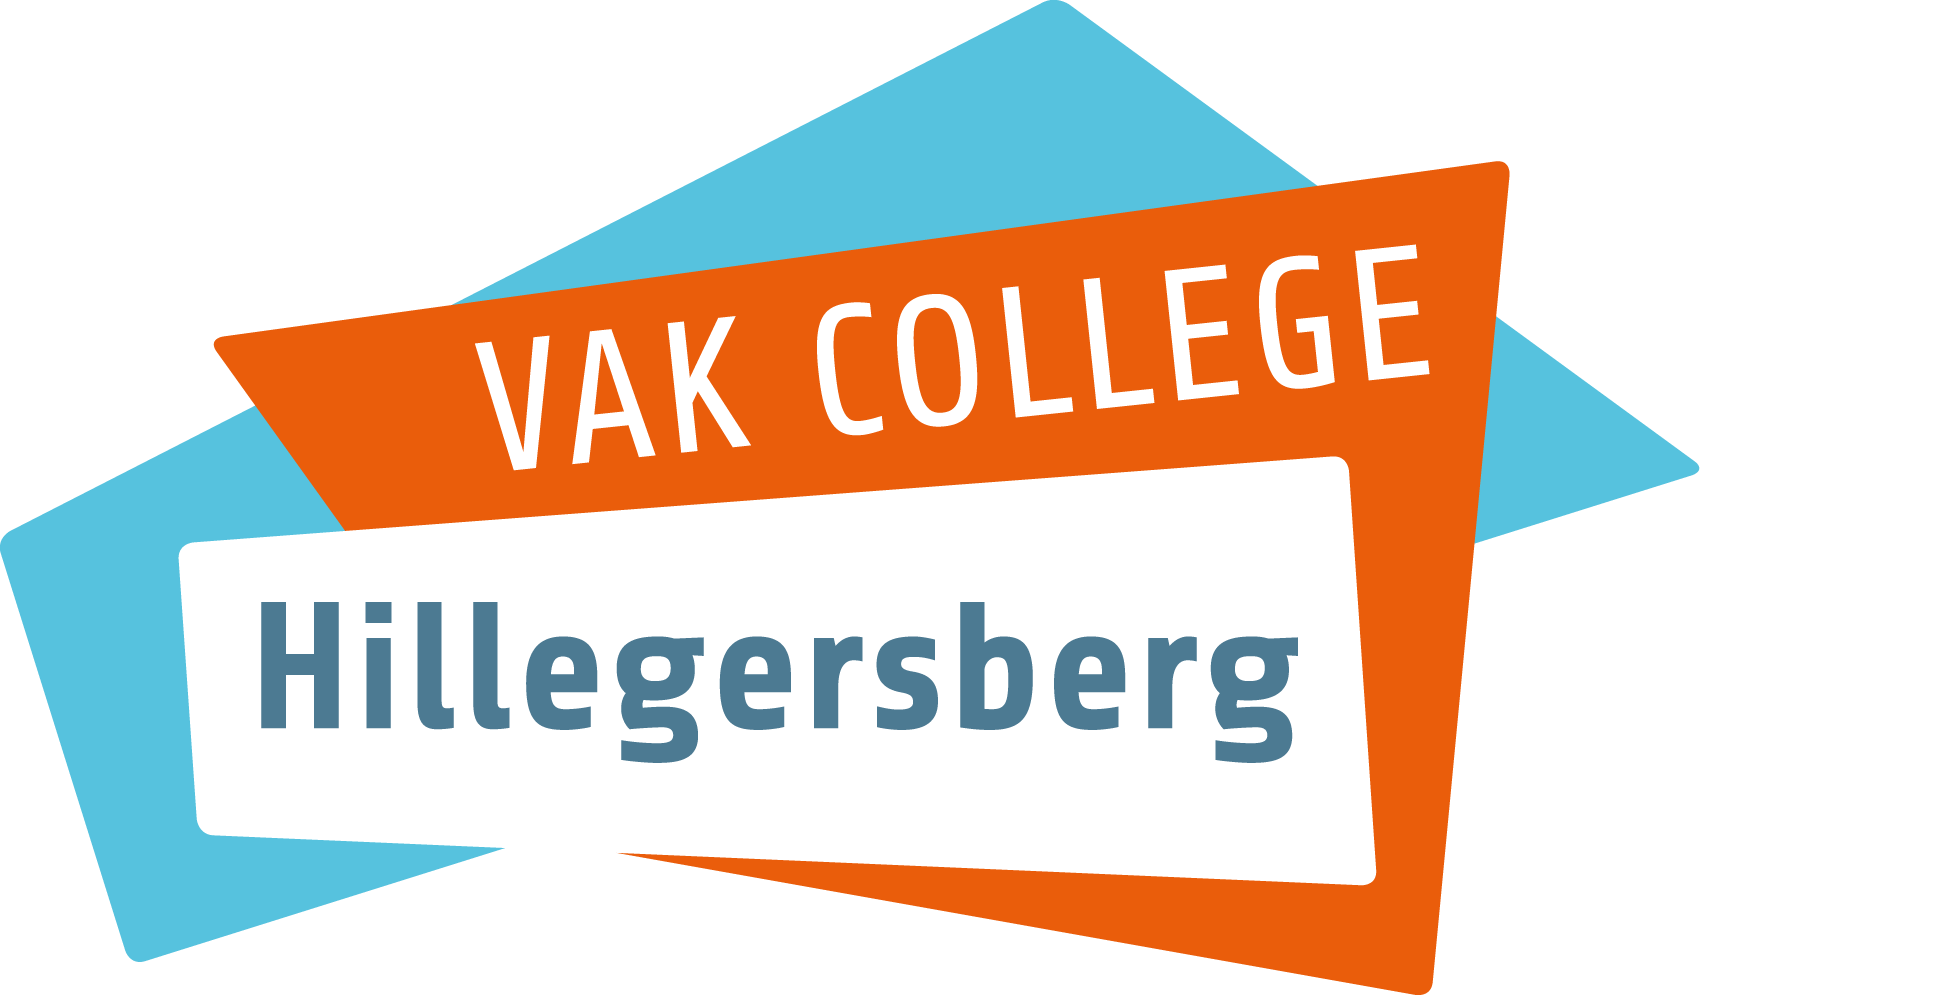 Vak College Hillegersberg logo